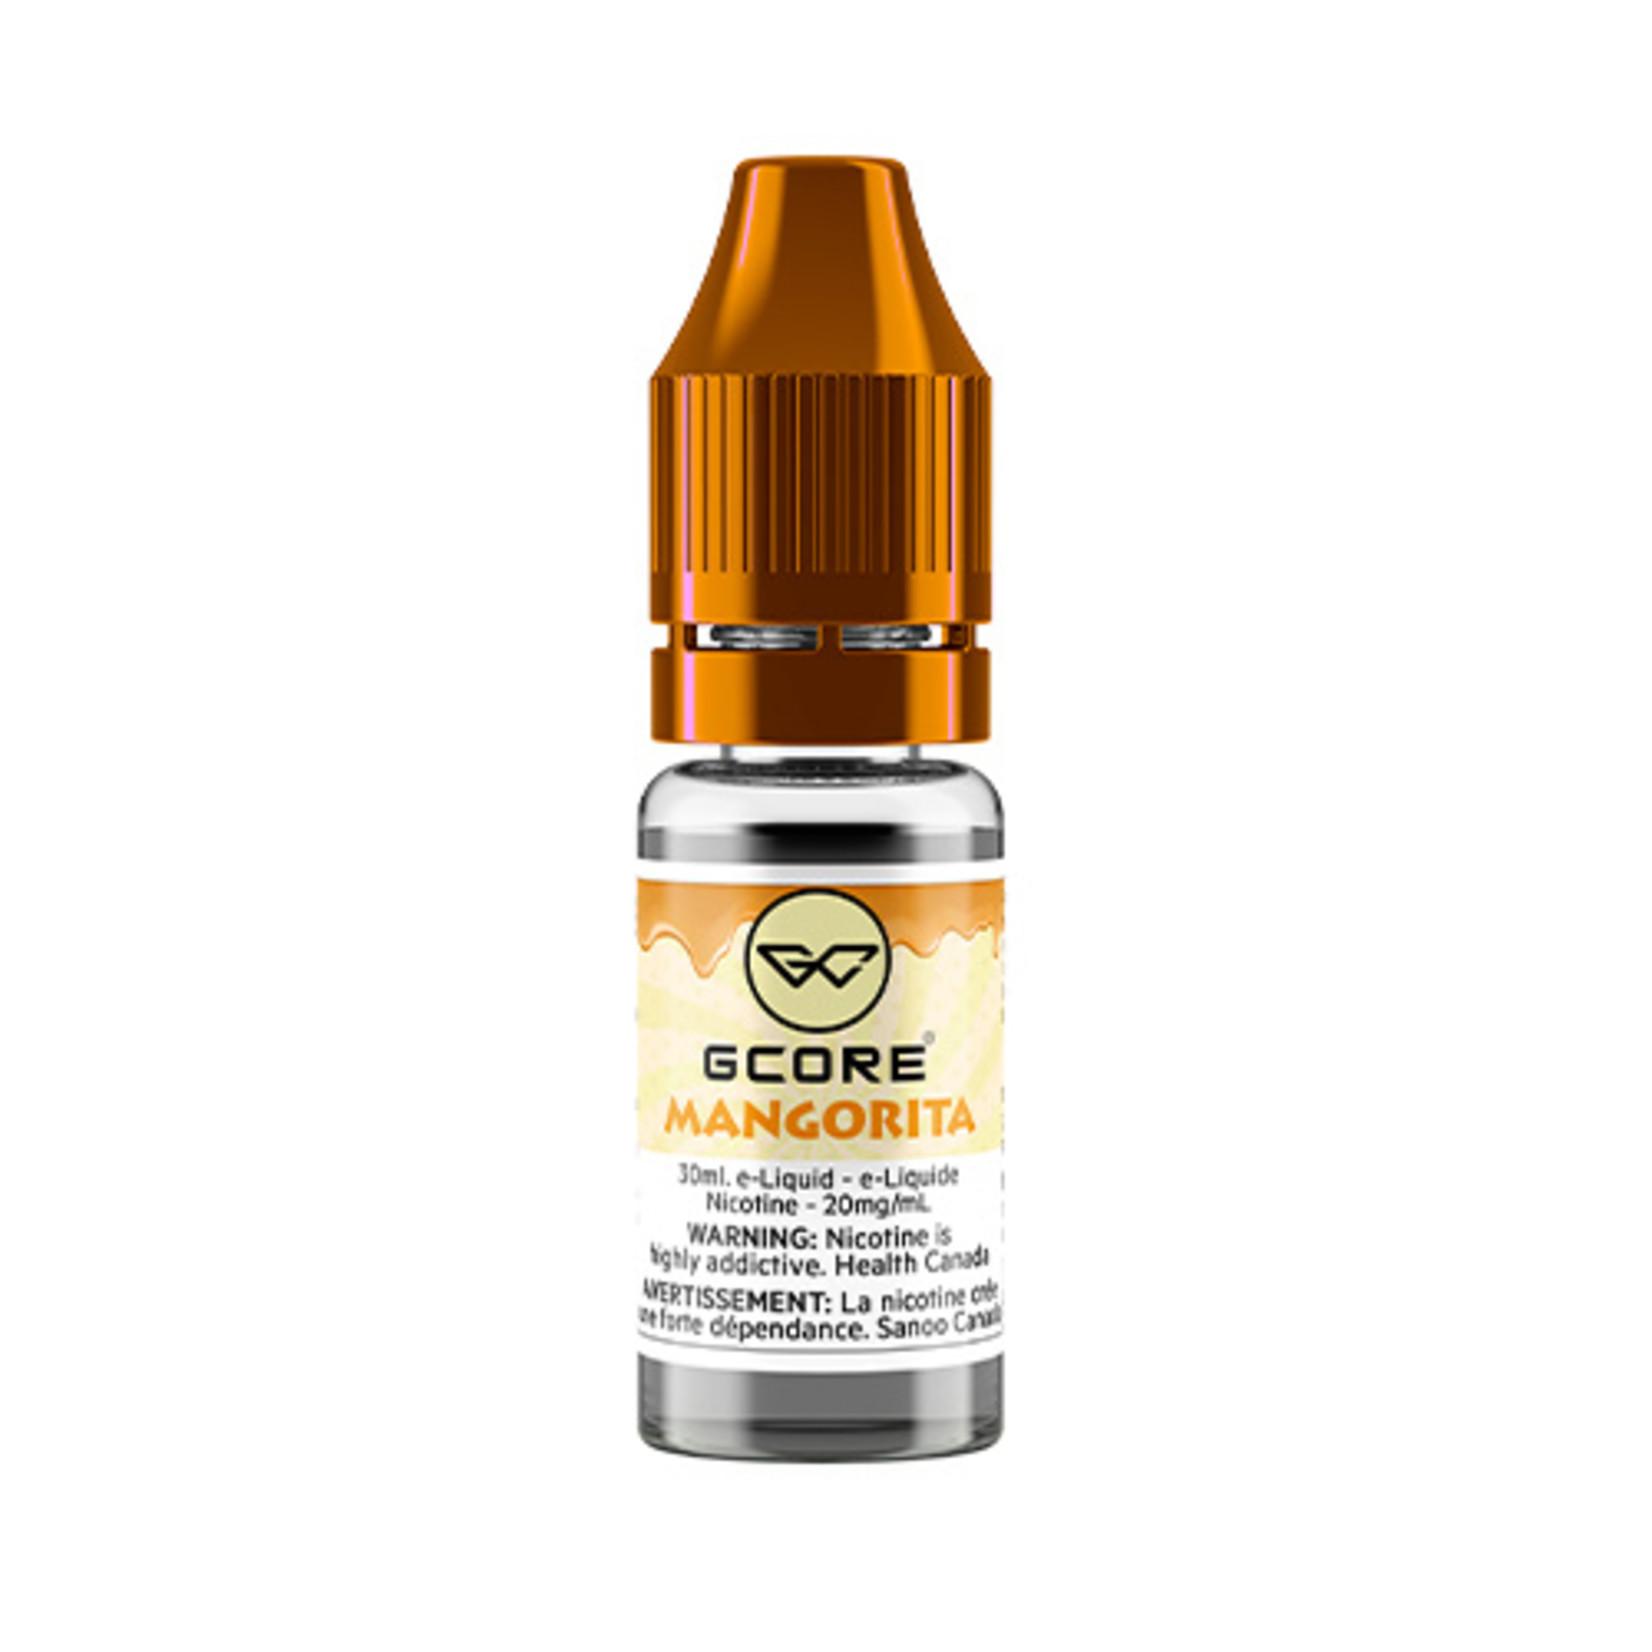 Gcore Vape Mangorita Juice